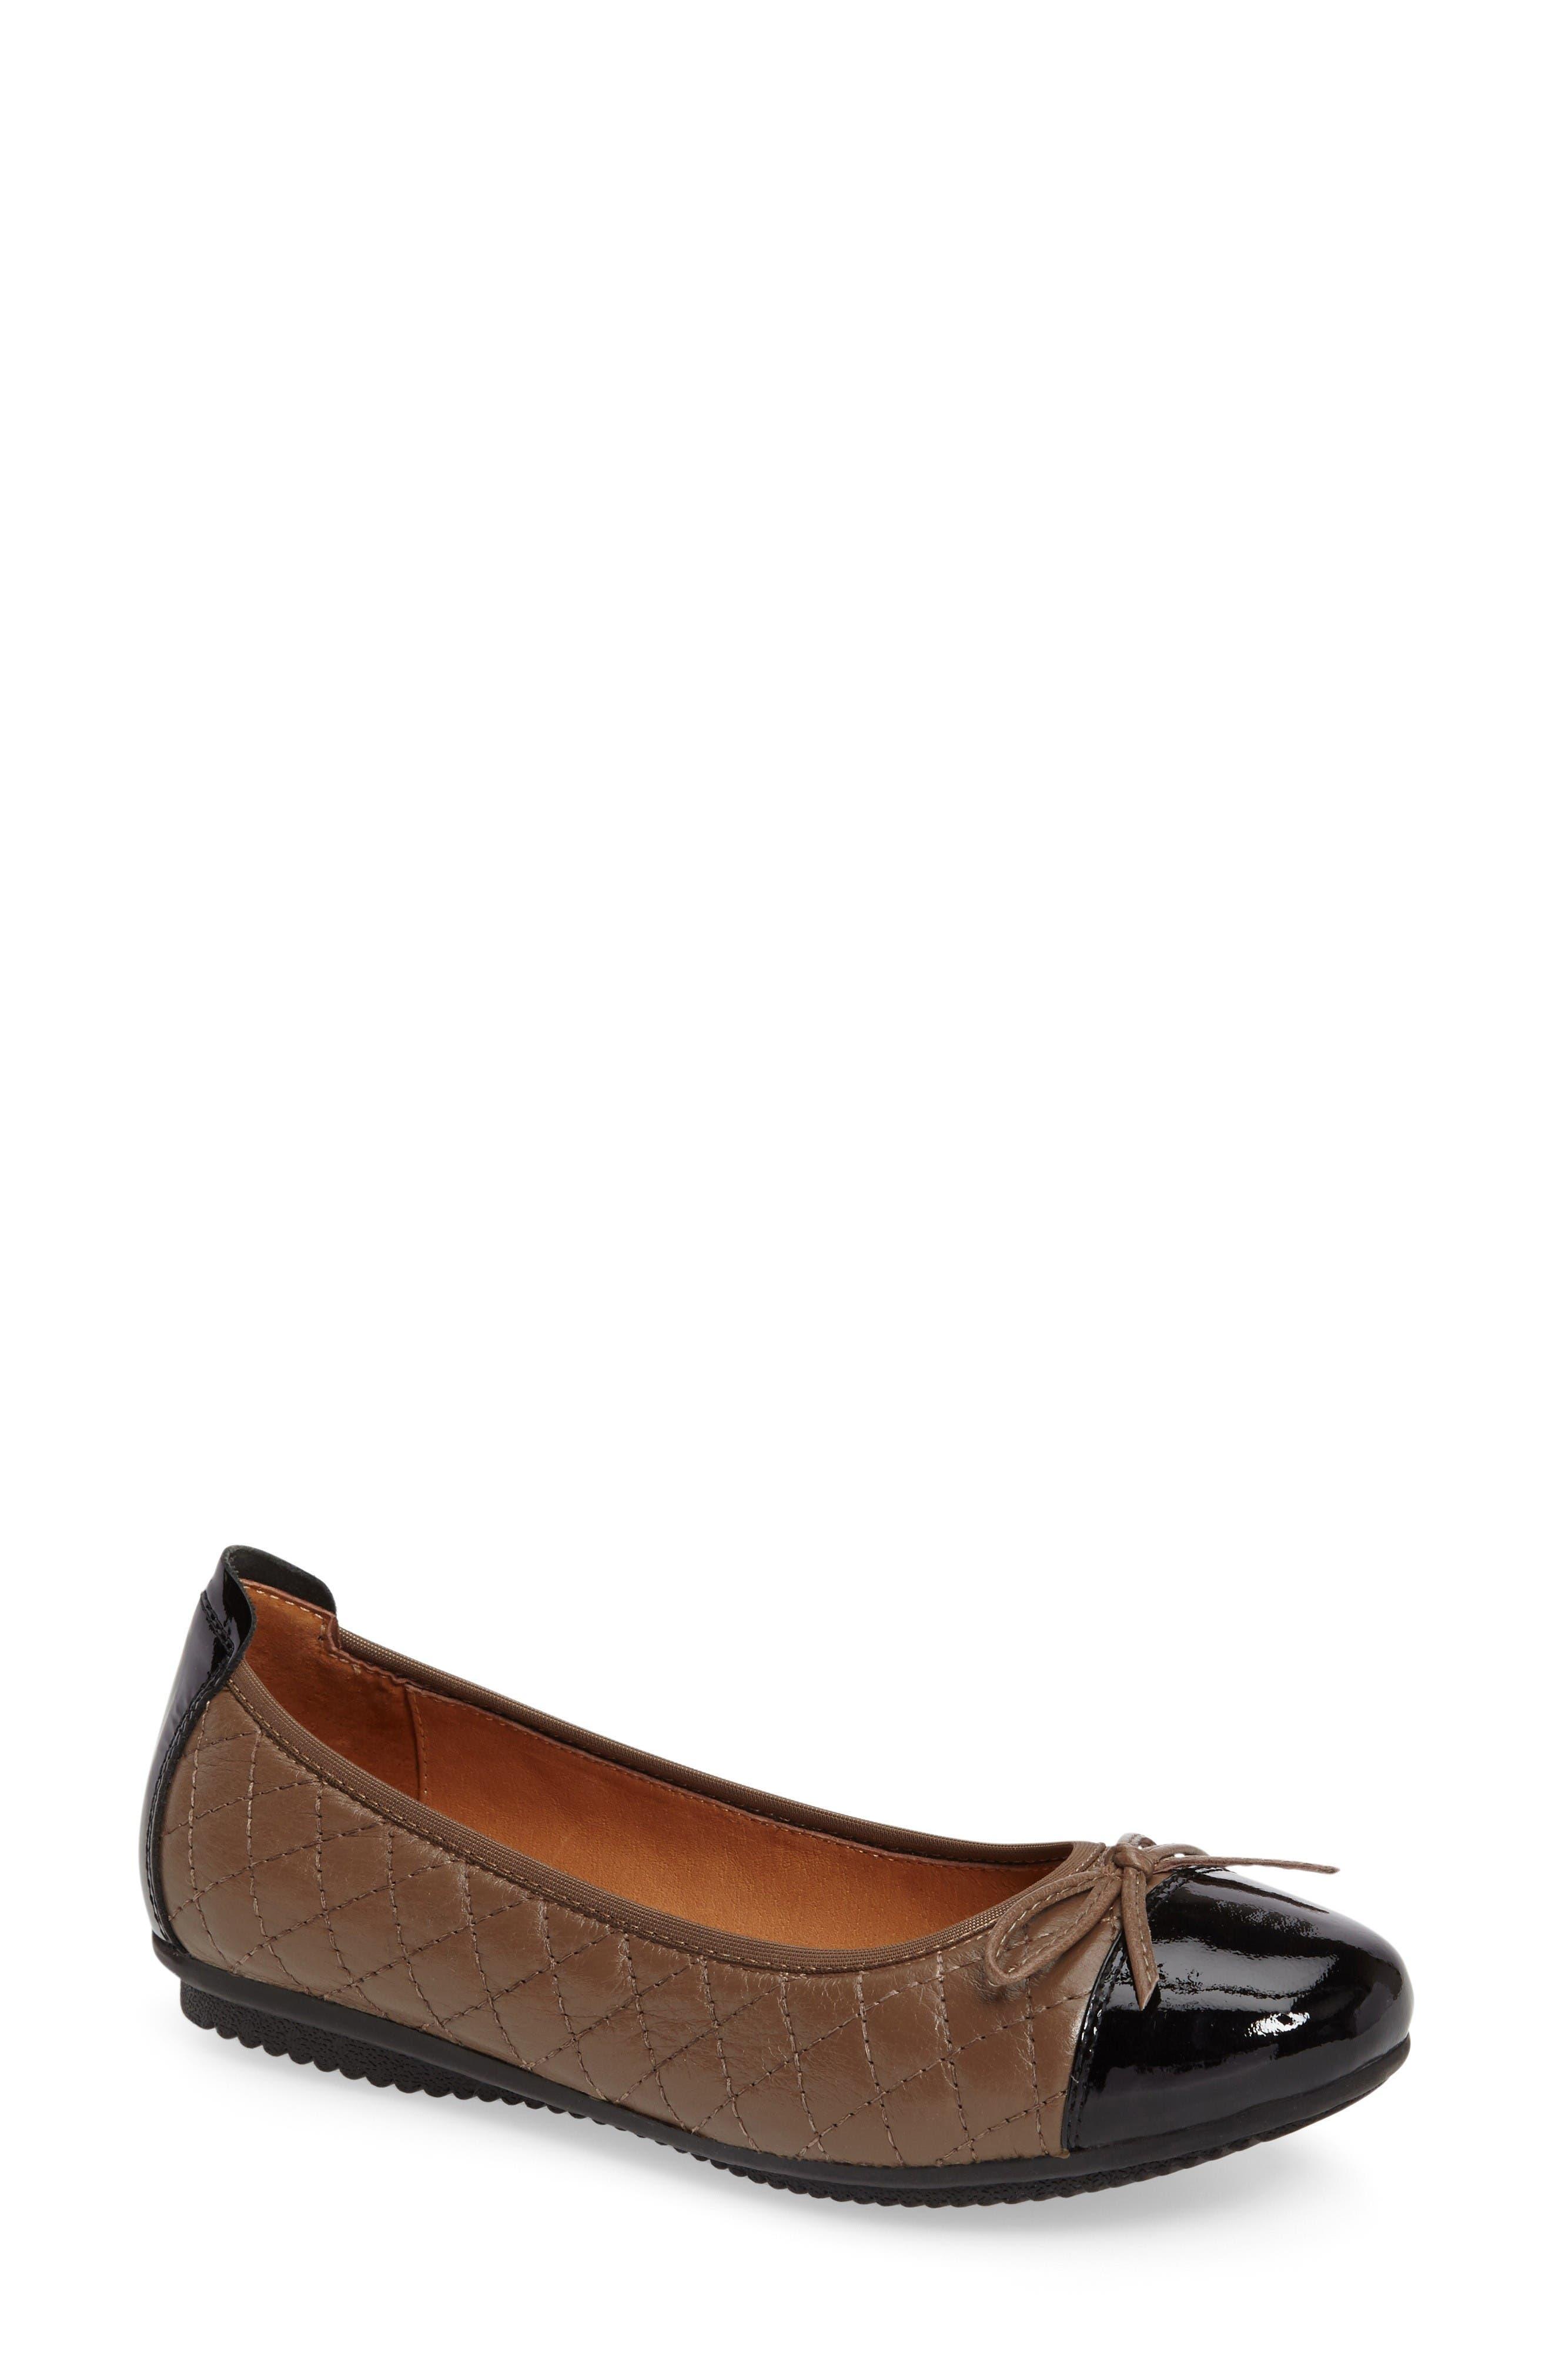 'Pippa 25' Cap Toe Flat,                             Main thumbnail 1, color,                             Taupe/ Black Leather